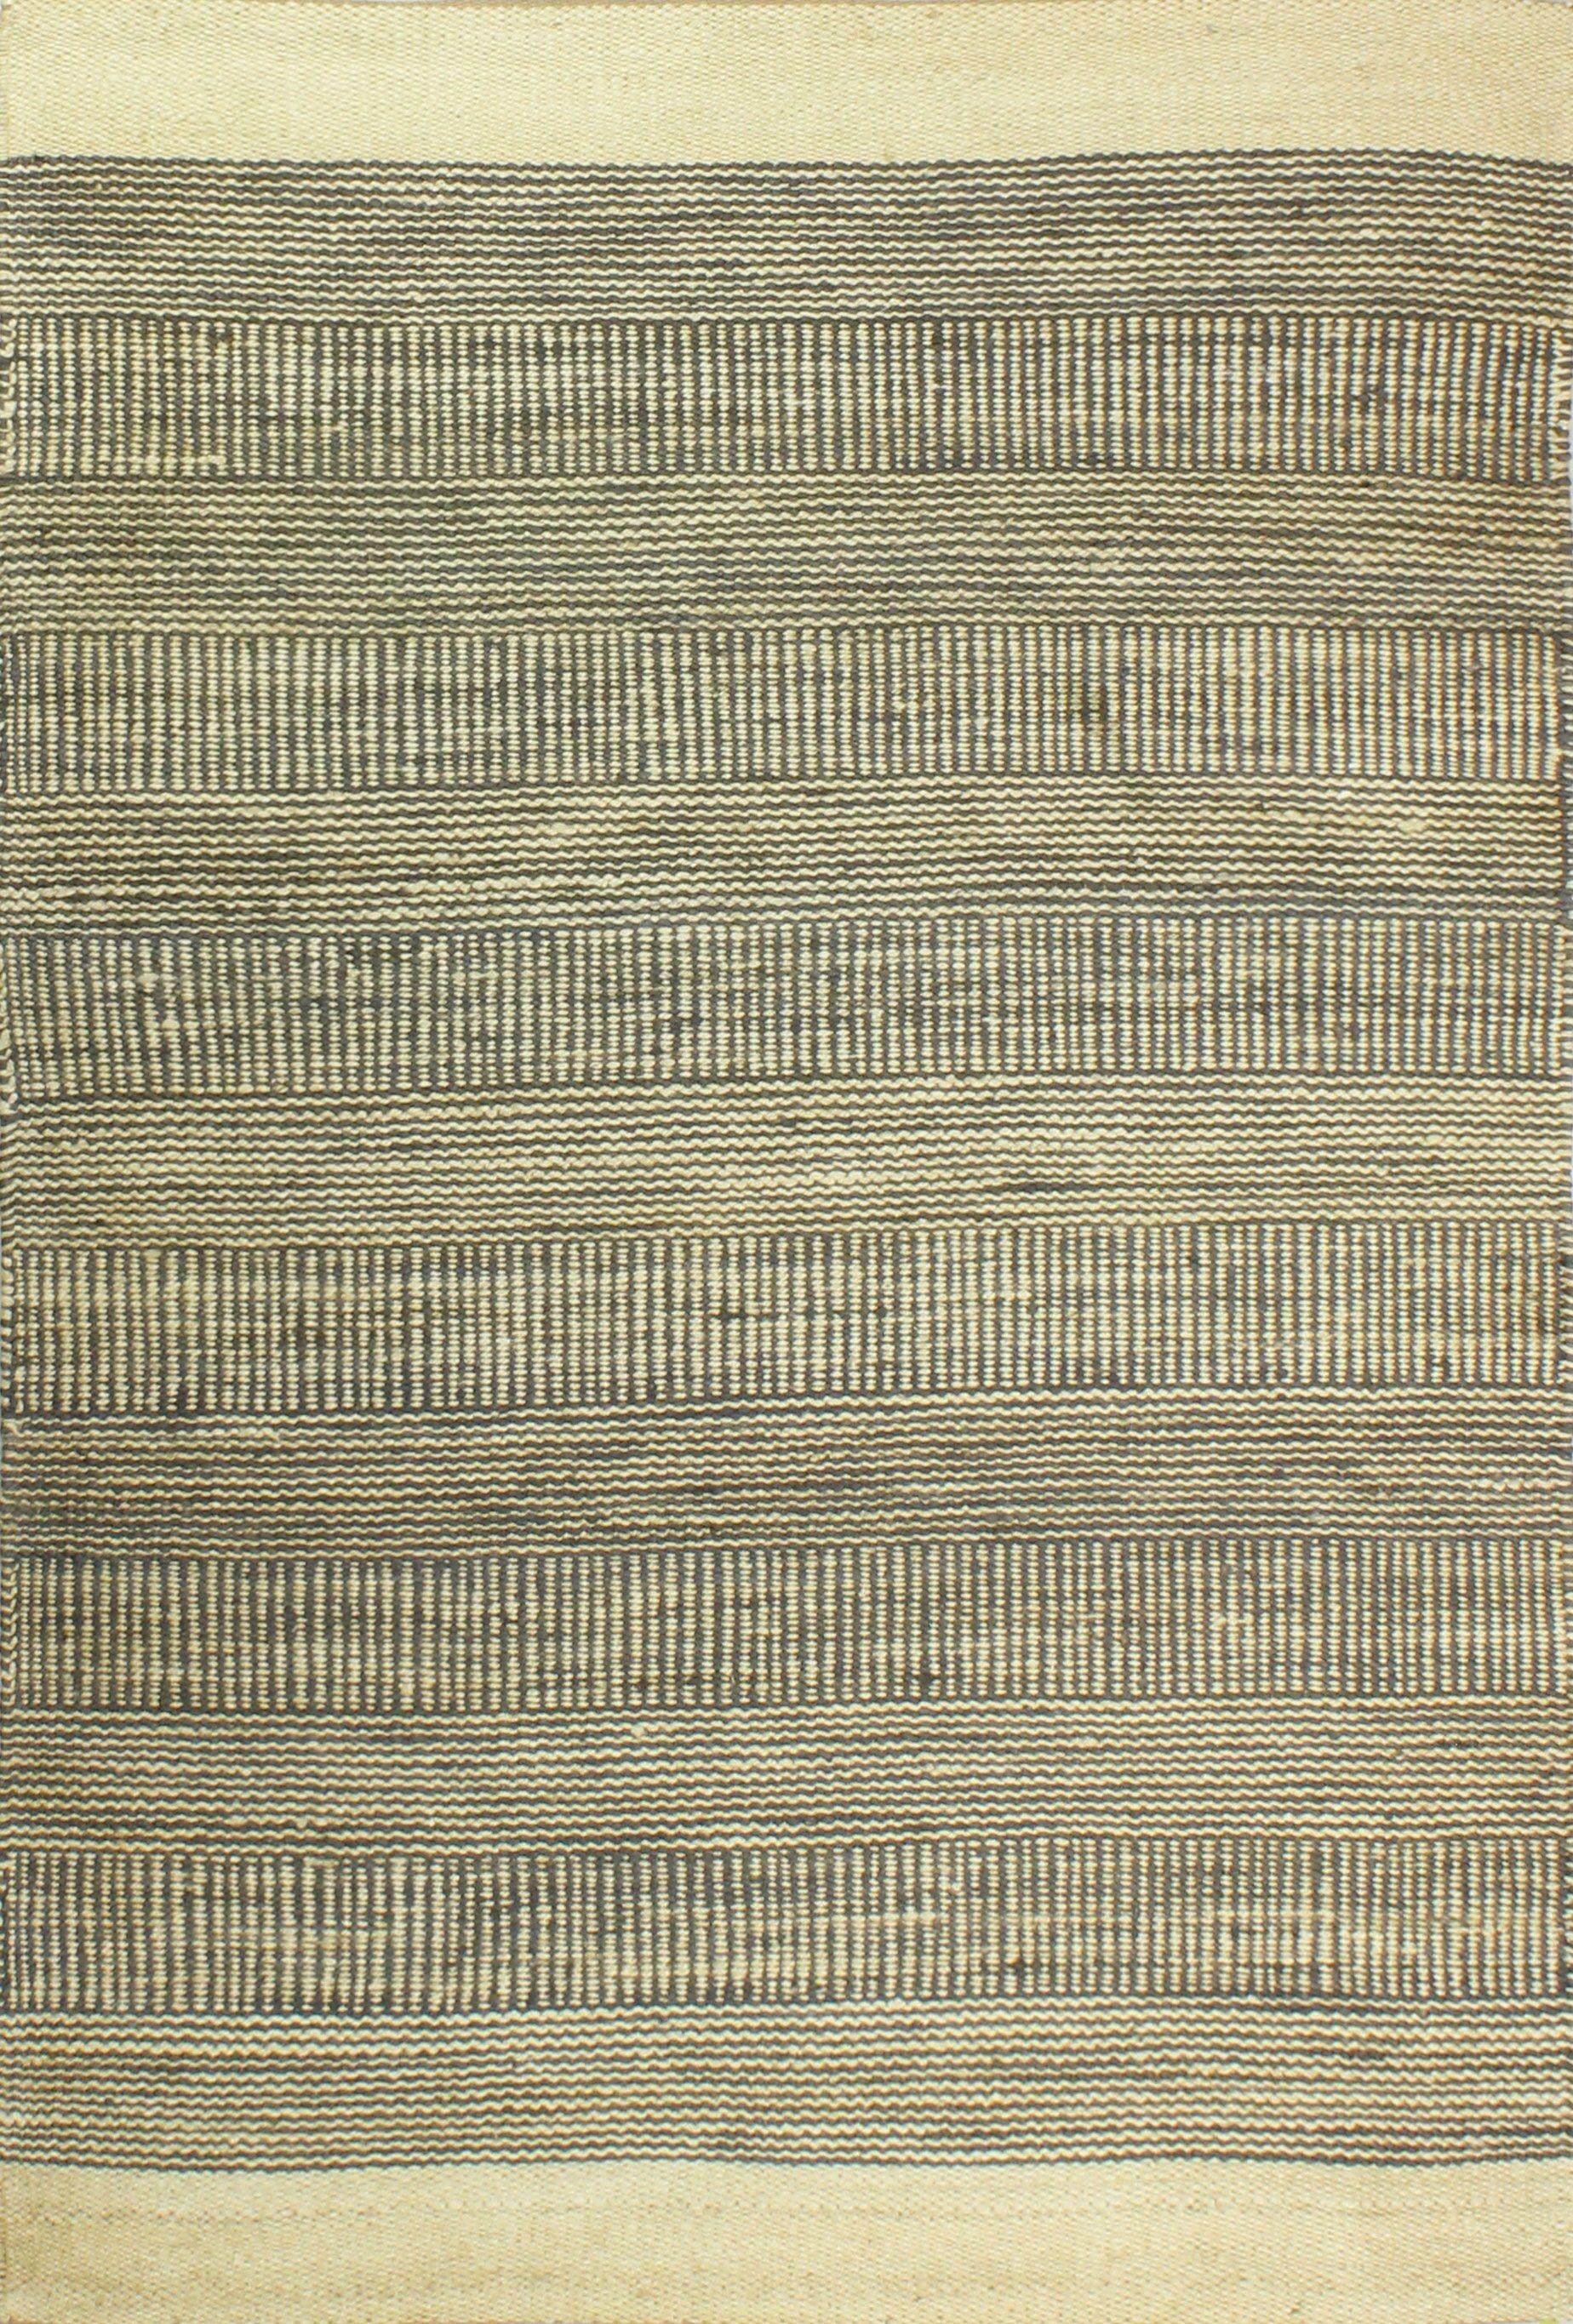 Hodge Hand-Knotted Cream/Slate Area Rug Rug Size: 5' x 7'6